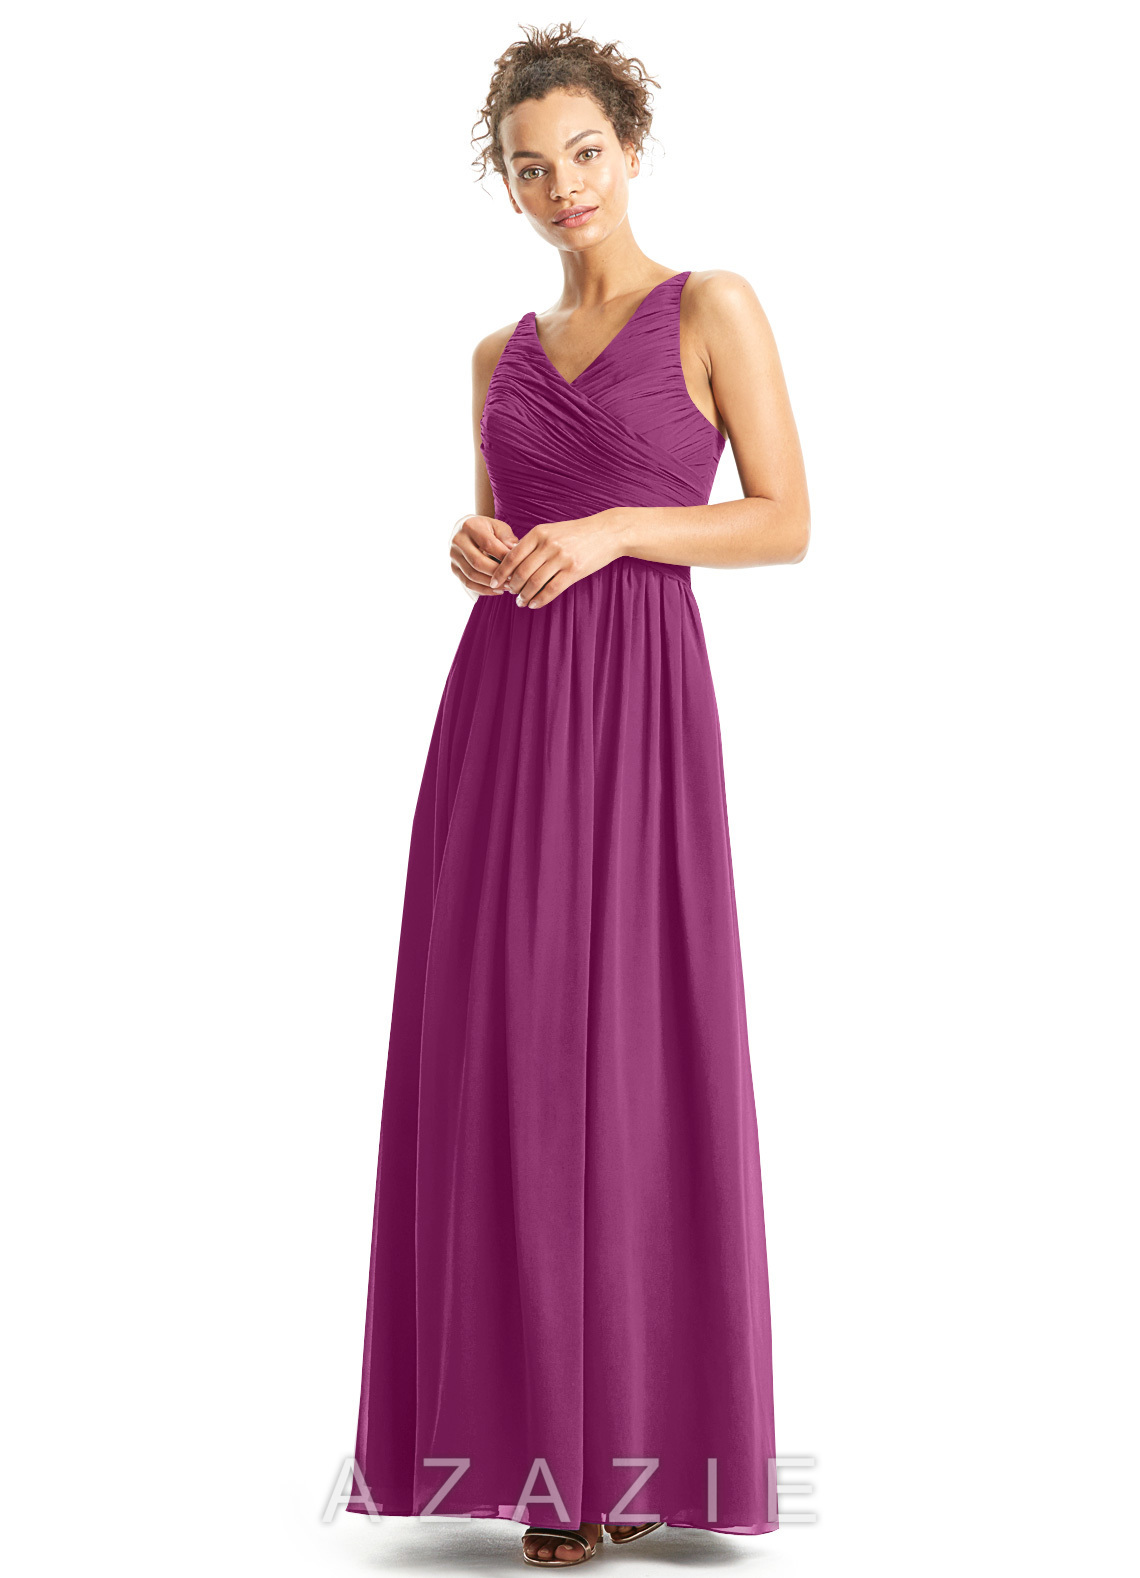 3fd63aedd8 Azazie Elaine Bridesmaid Dresses